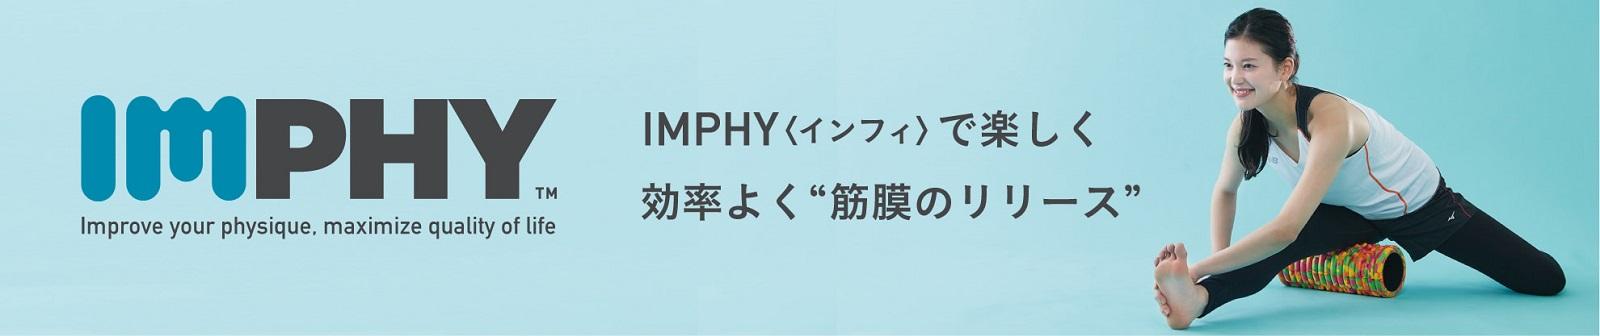 IMPHY公式